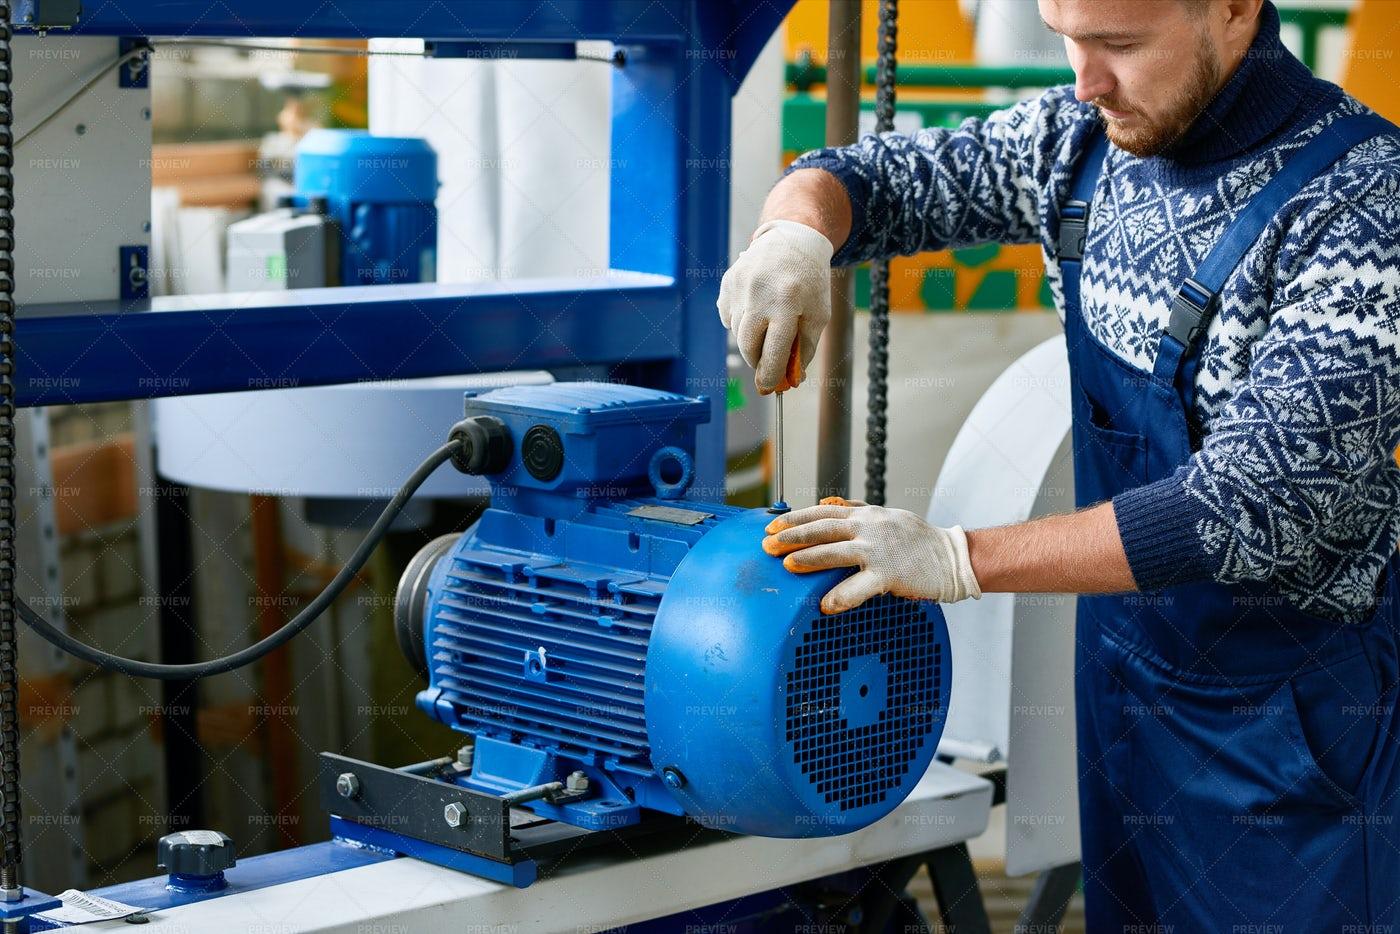 Repairman Fixing Machine Units At...: Stock Photos